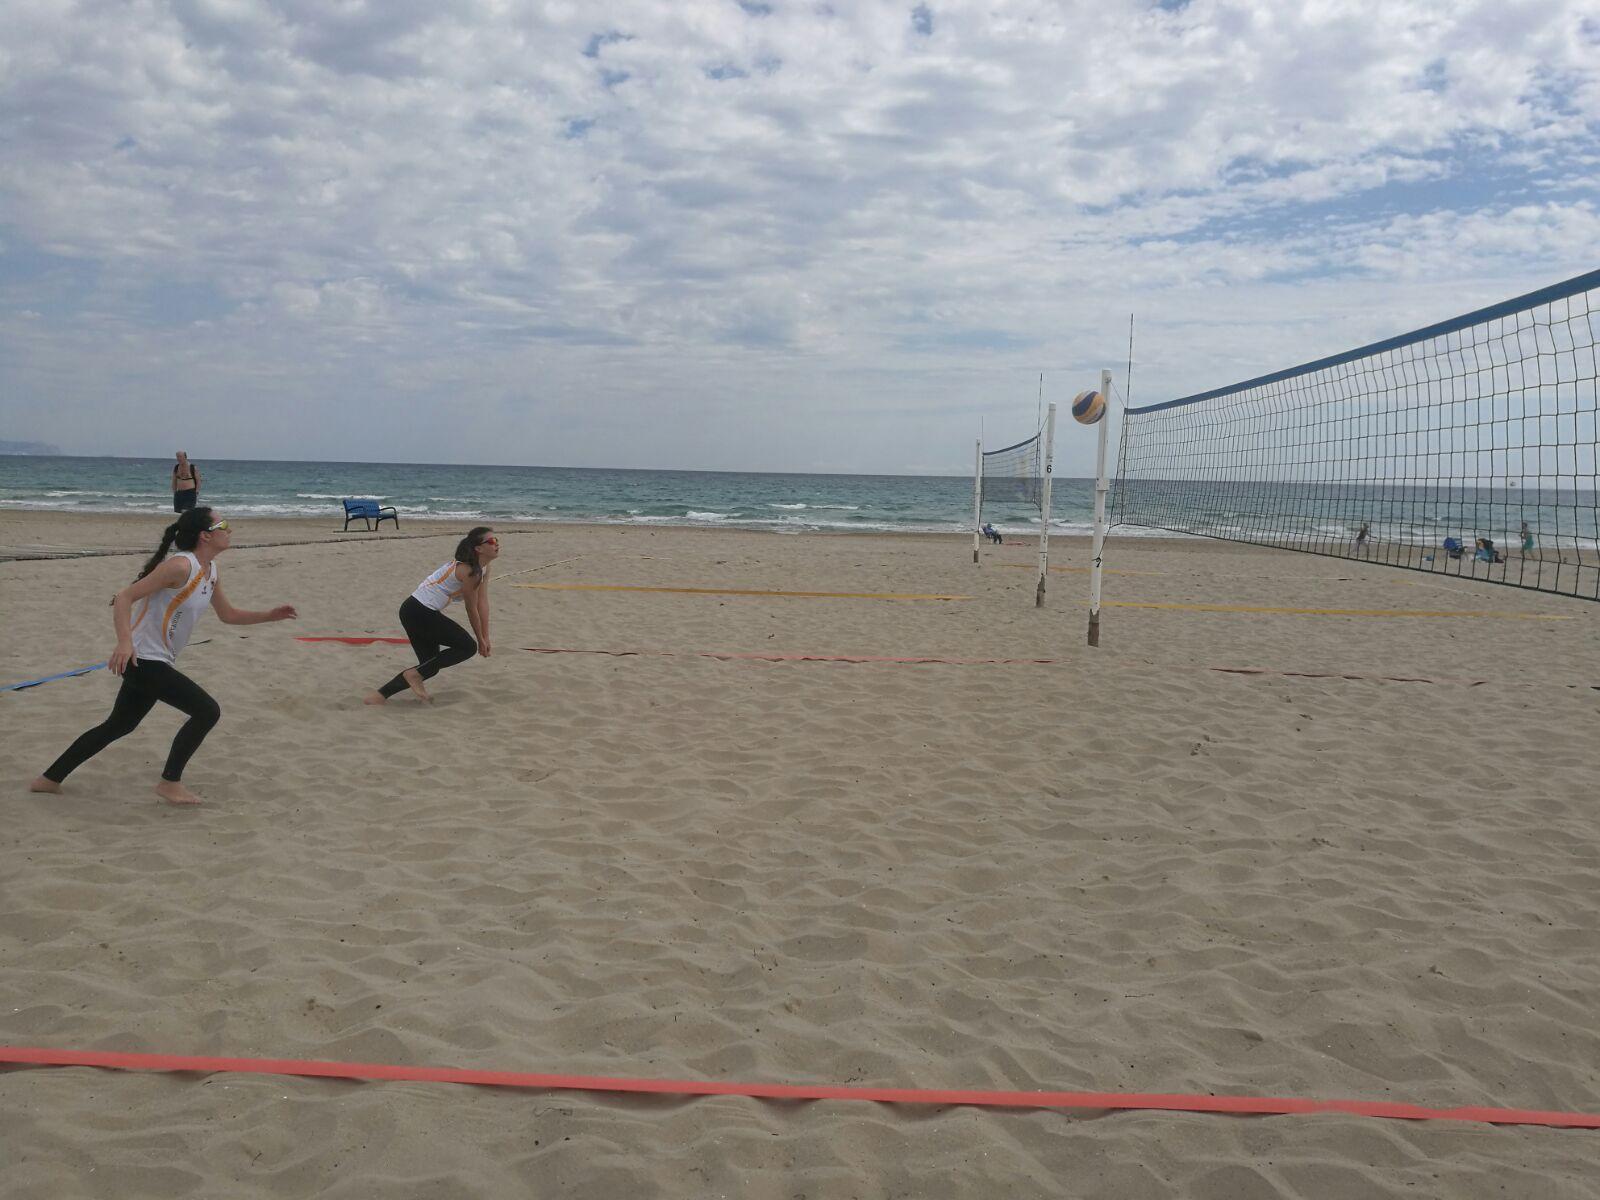 Volleyball voleyboll t voley ropa deportiva y deporte - Red voley piscina ...